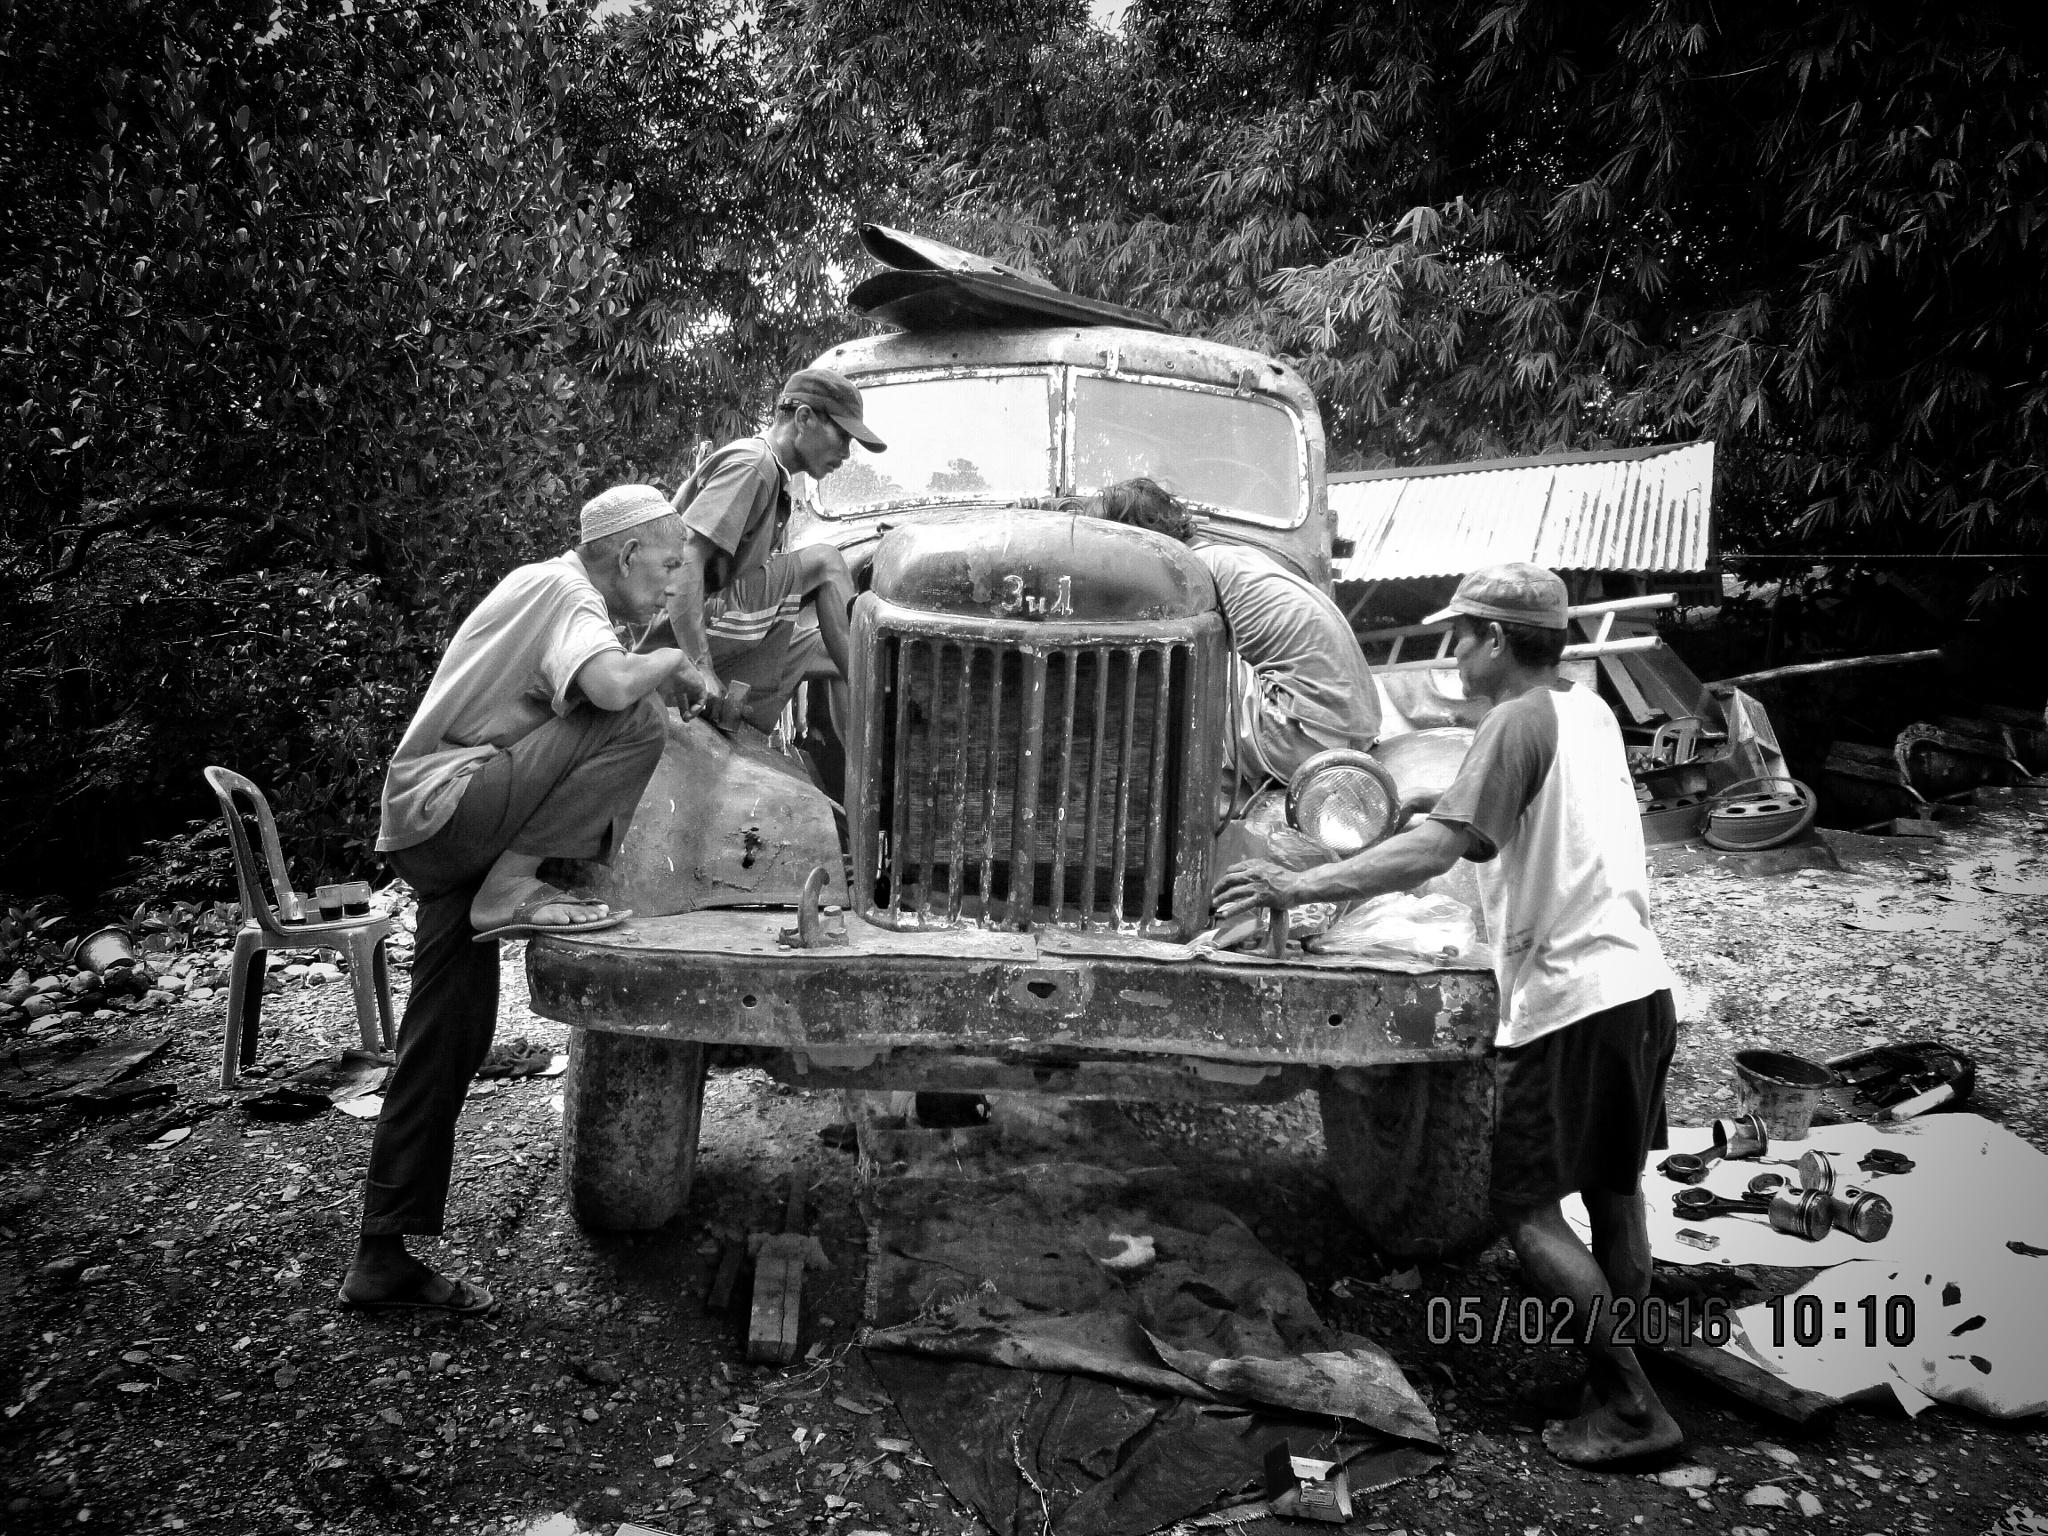 The Mechanic  by KangPermana